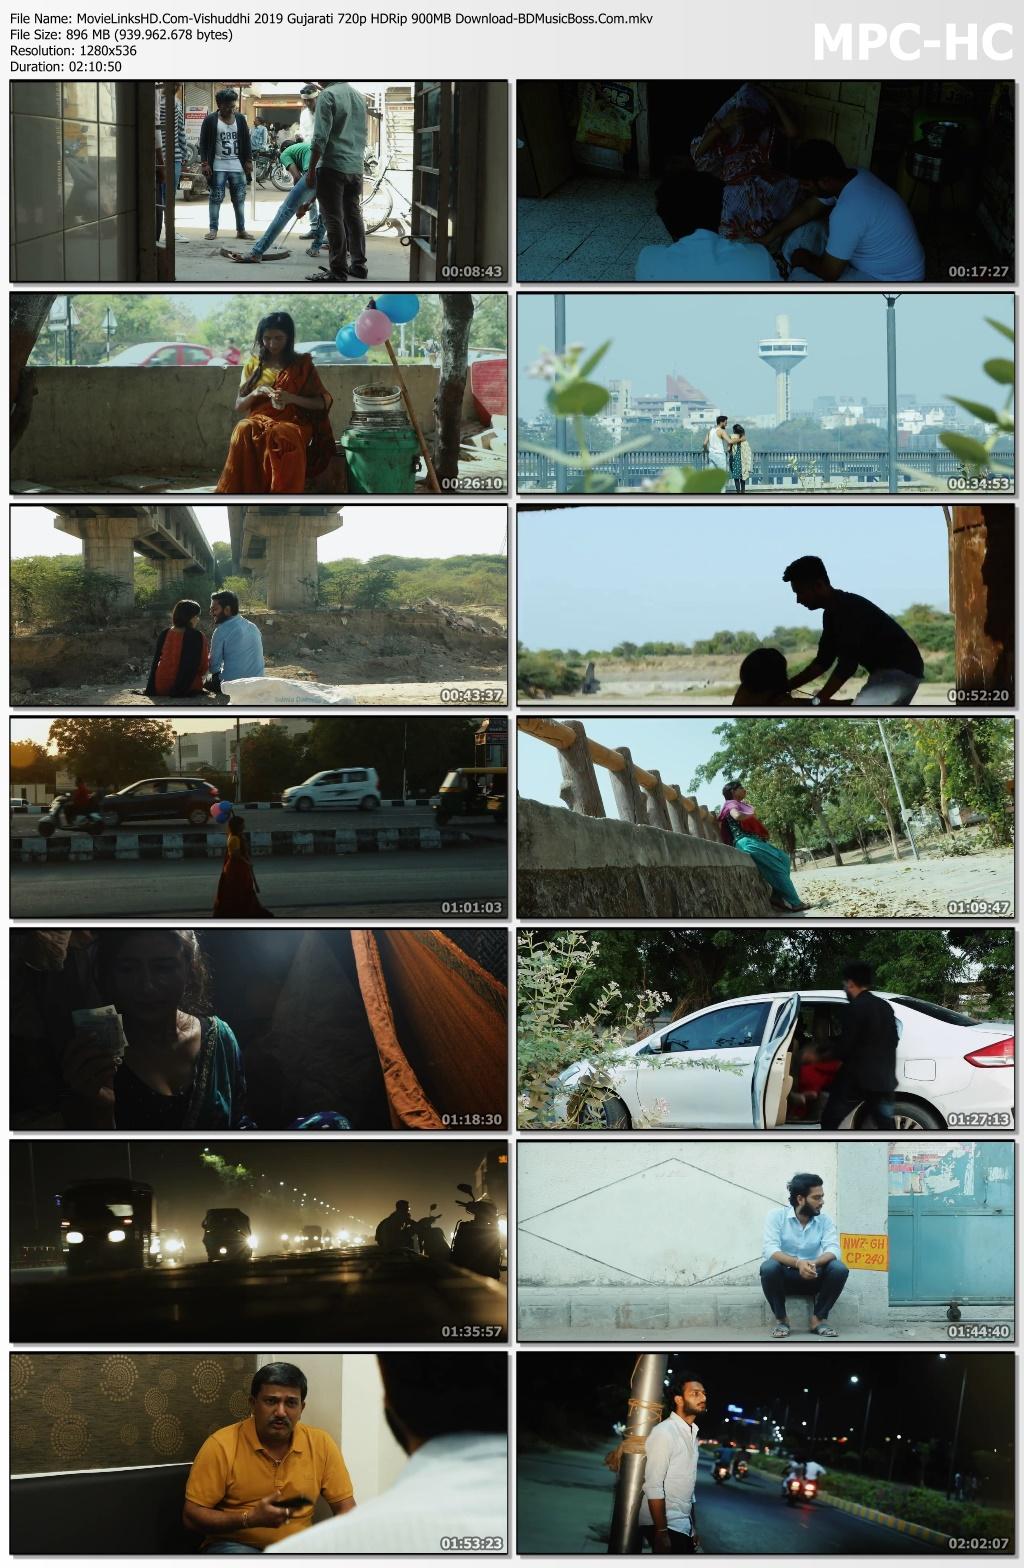 Movie-Links-HD-Com-Vishuddhi-2019-Gujarati-720p-HDRip-900-MB-Download-BDMusic-Boss-Com-mkv-thumbs